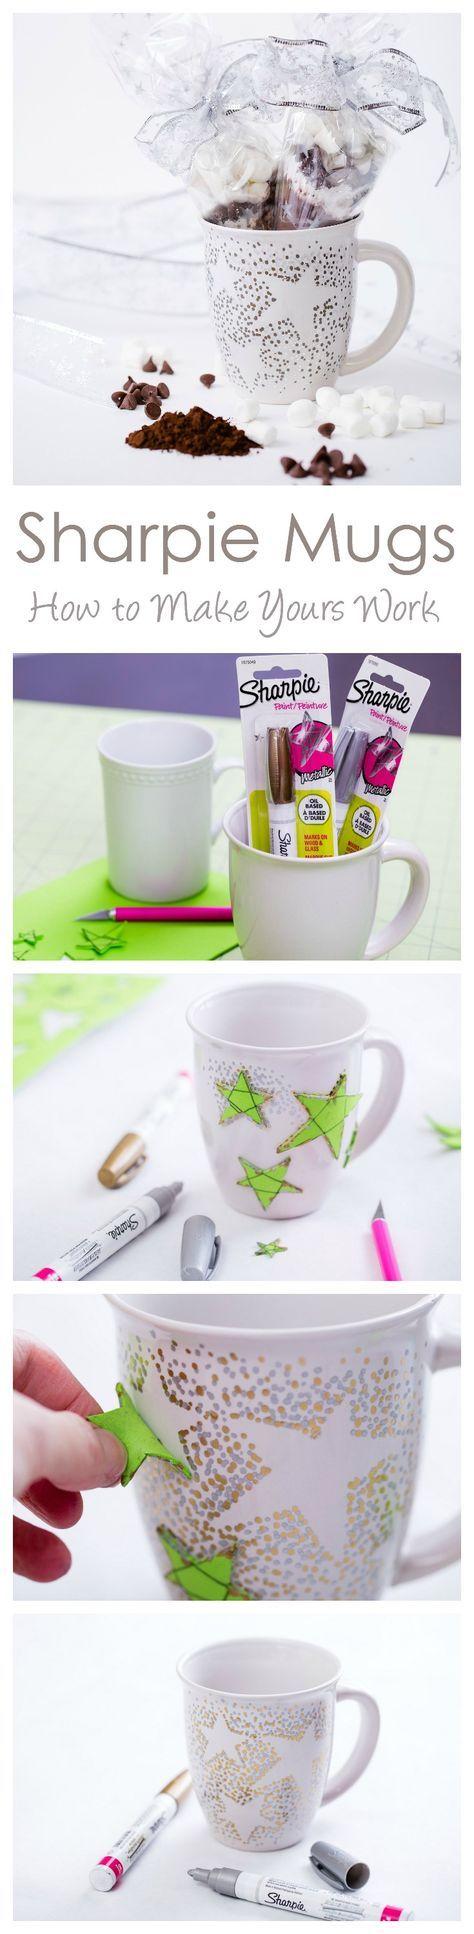 17 Best Ideas About Sharpie Mugs On Pinterest Diy Mug